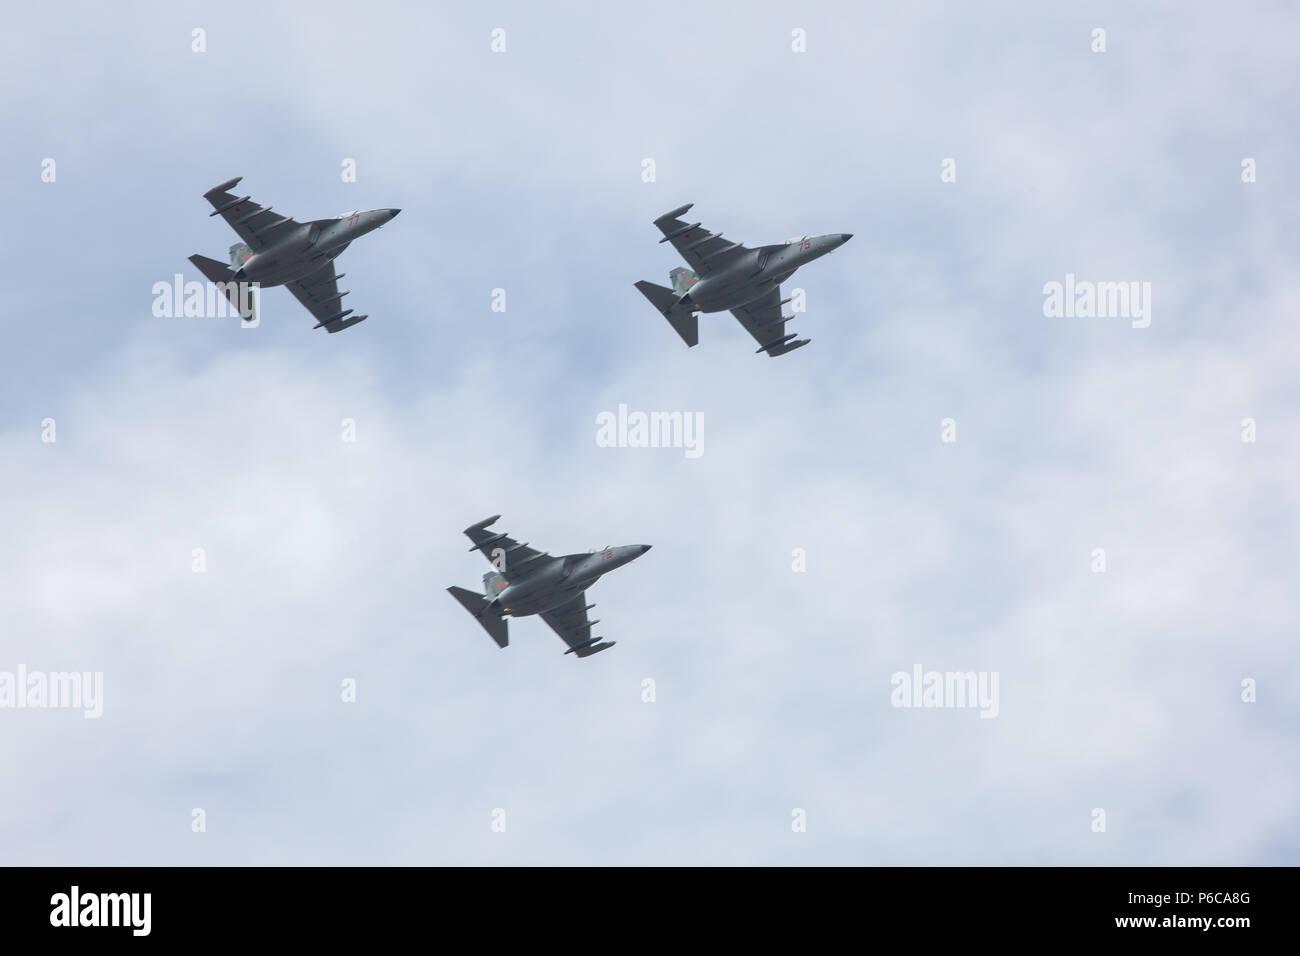 airplane, military aircraft Stock Photo